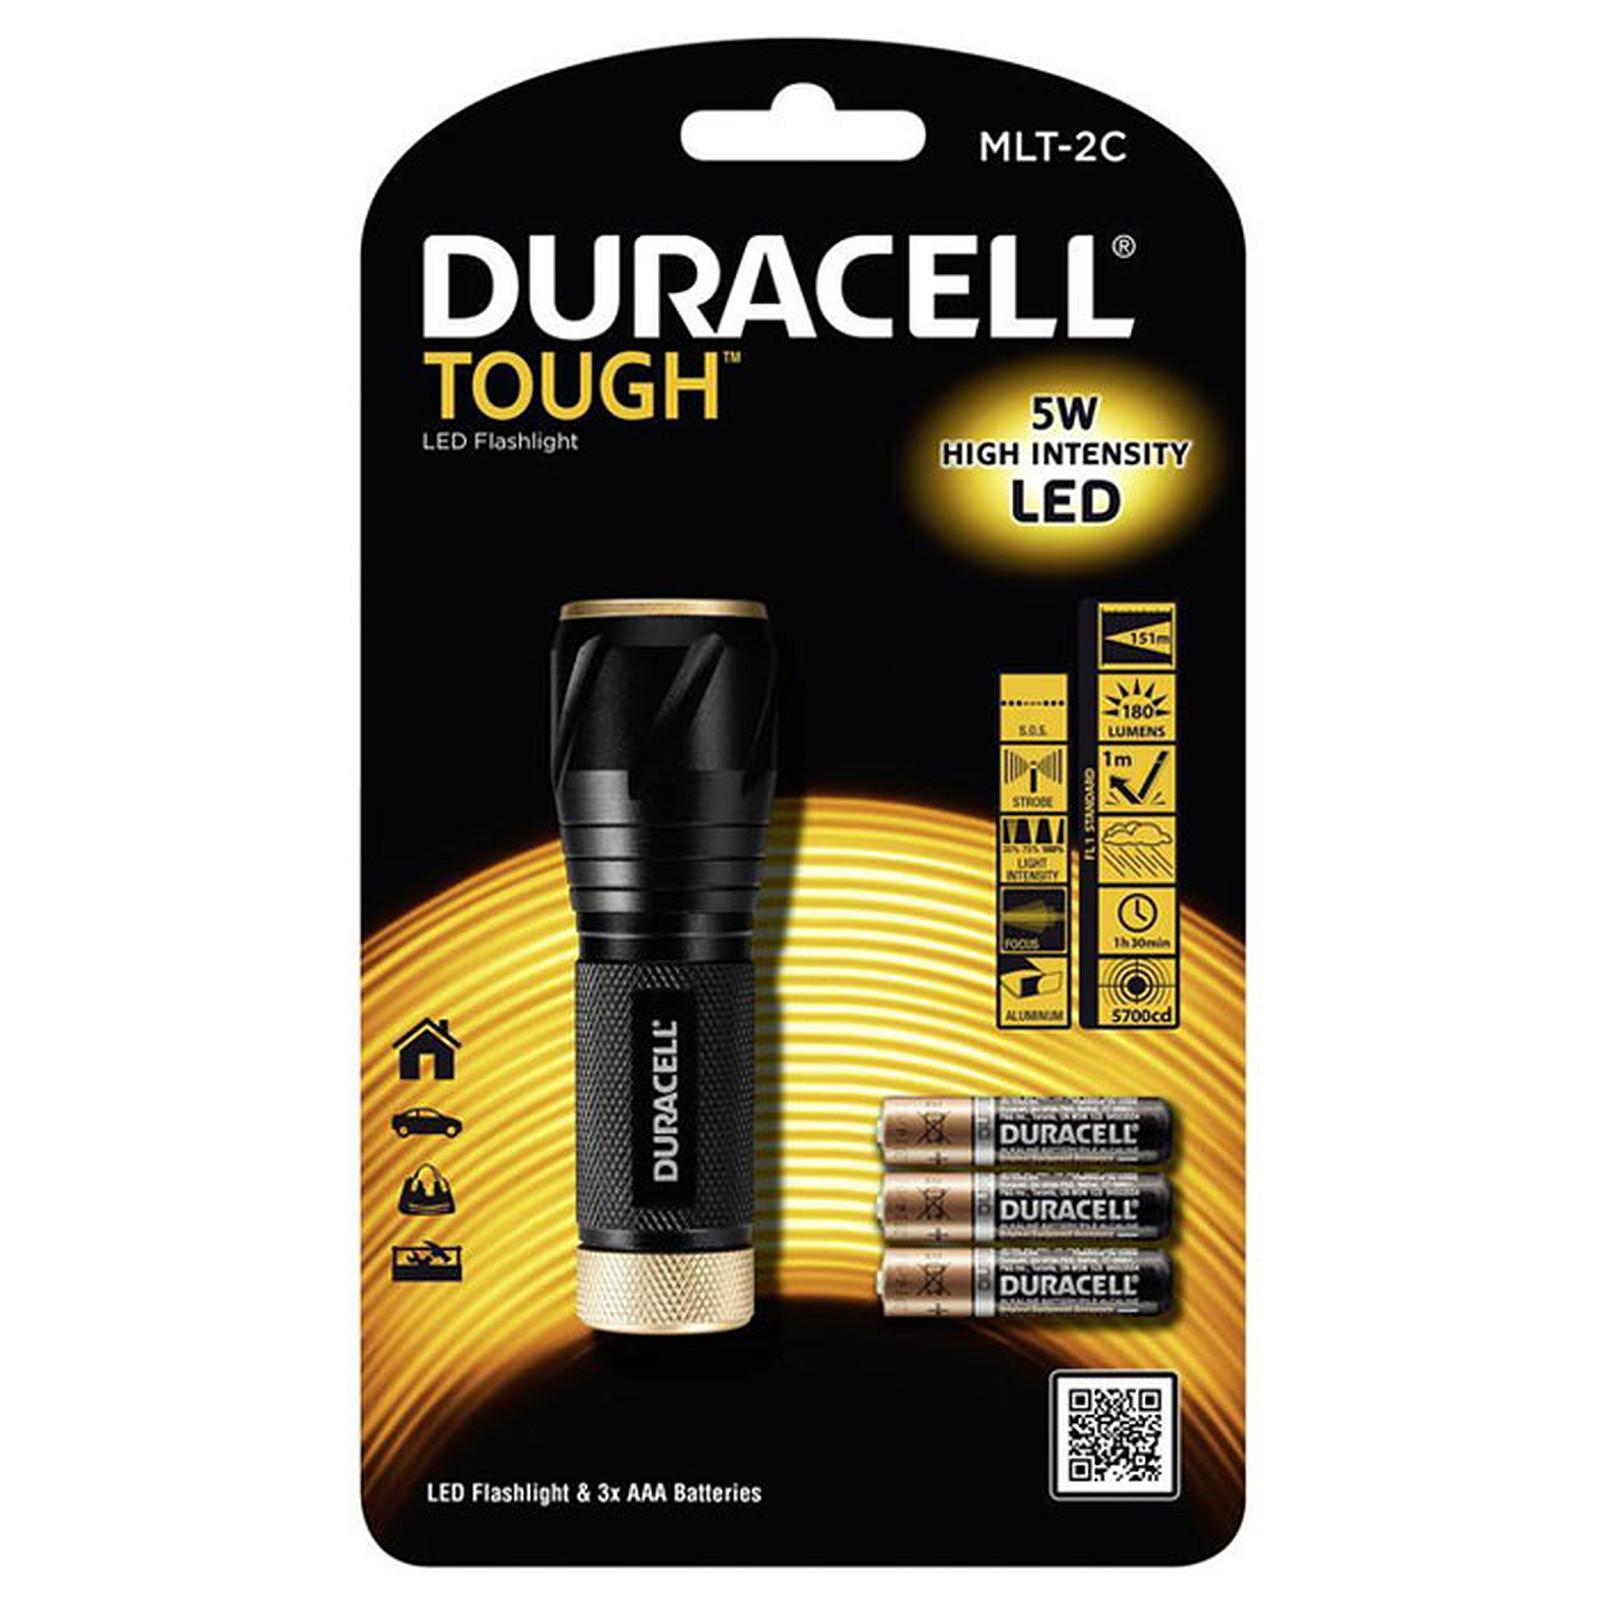 Duracell Tough Multi-Pro MLT-2C